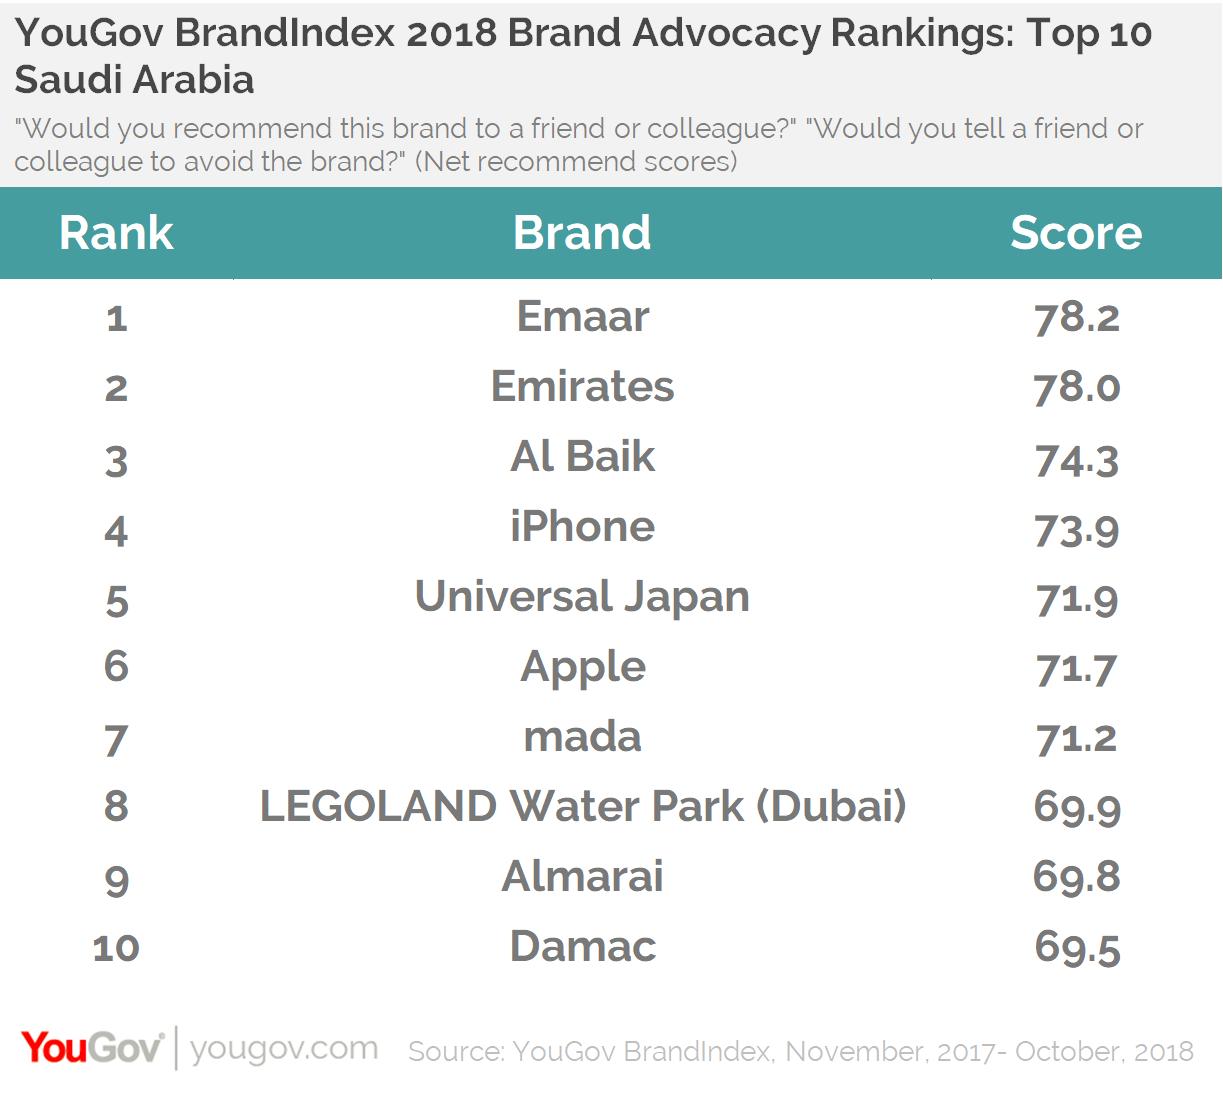 YouGov BrandIndex 2018 Brand Advocacy Rankings: Top 10 KSA